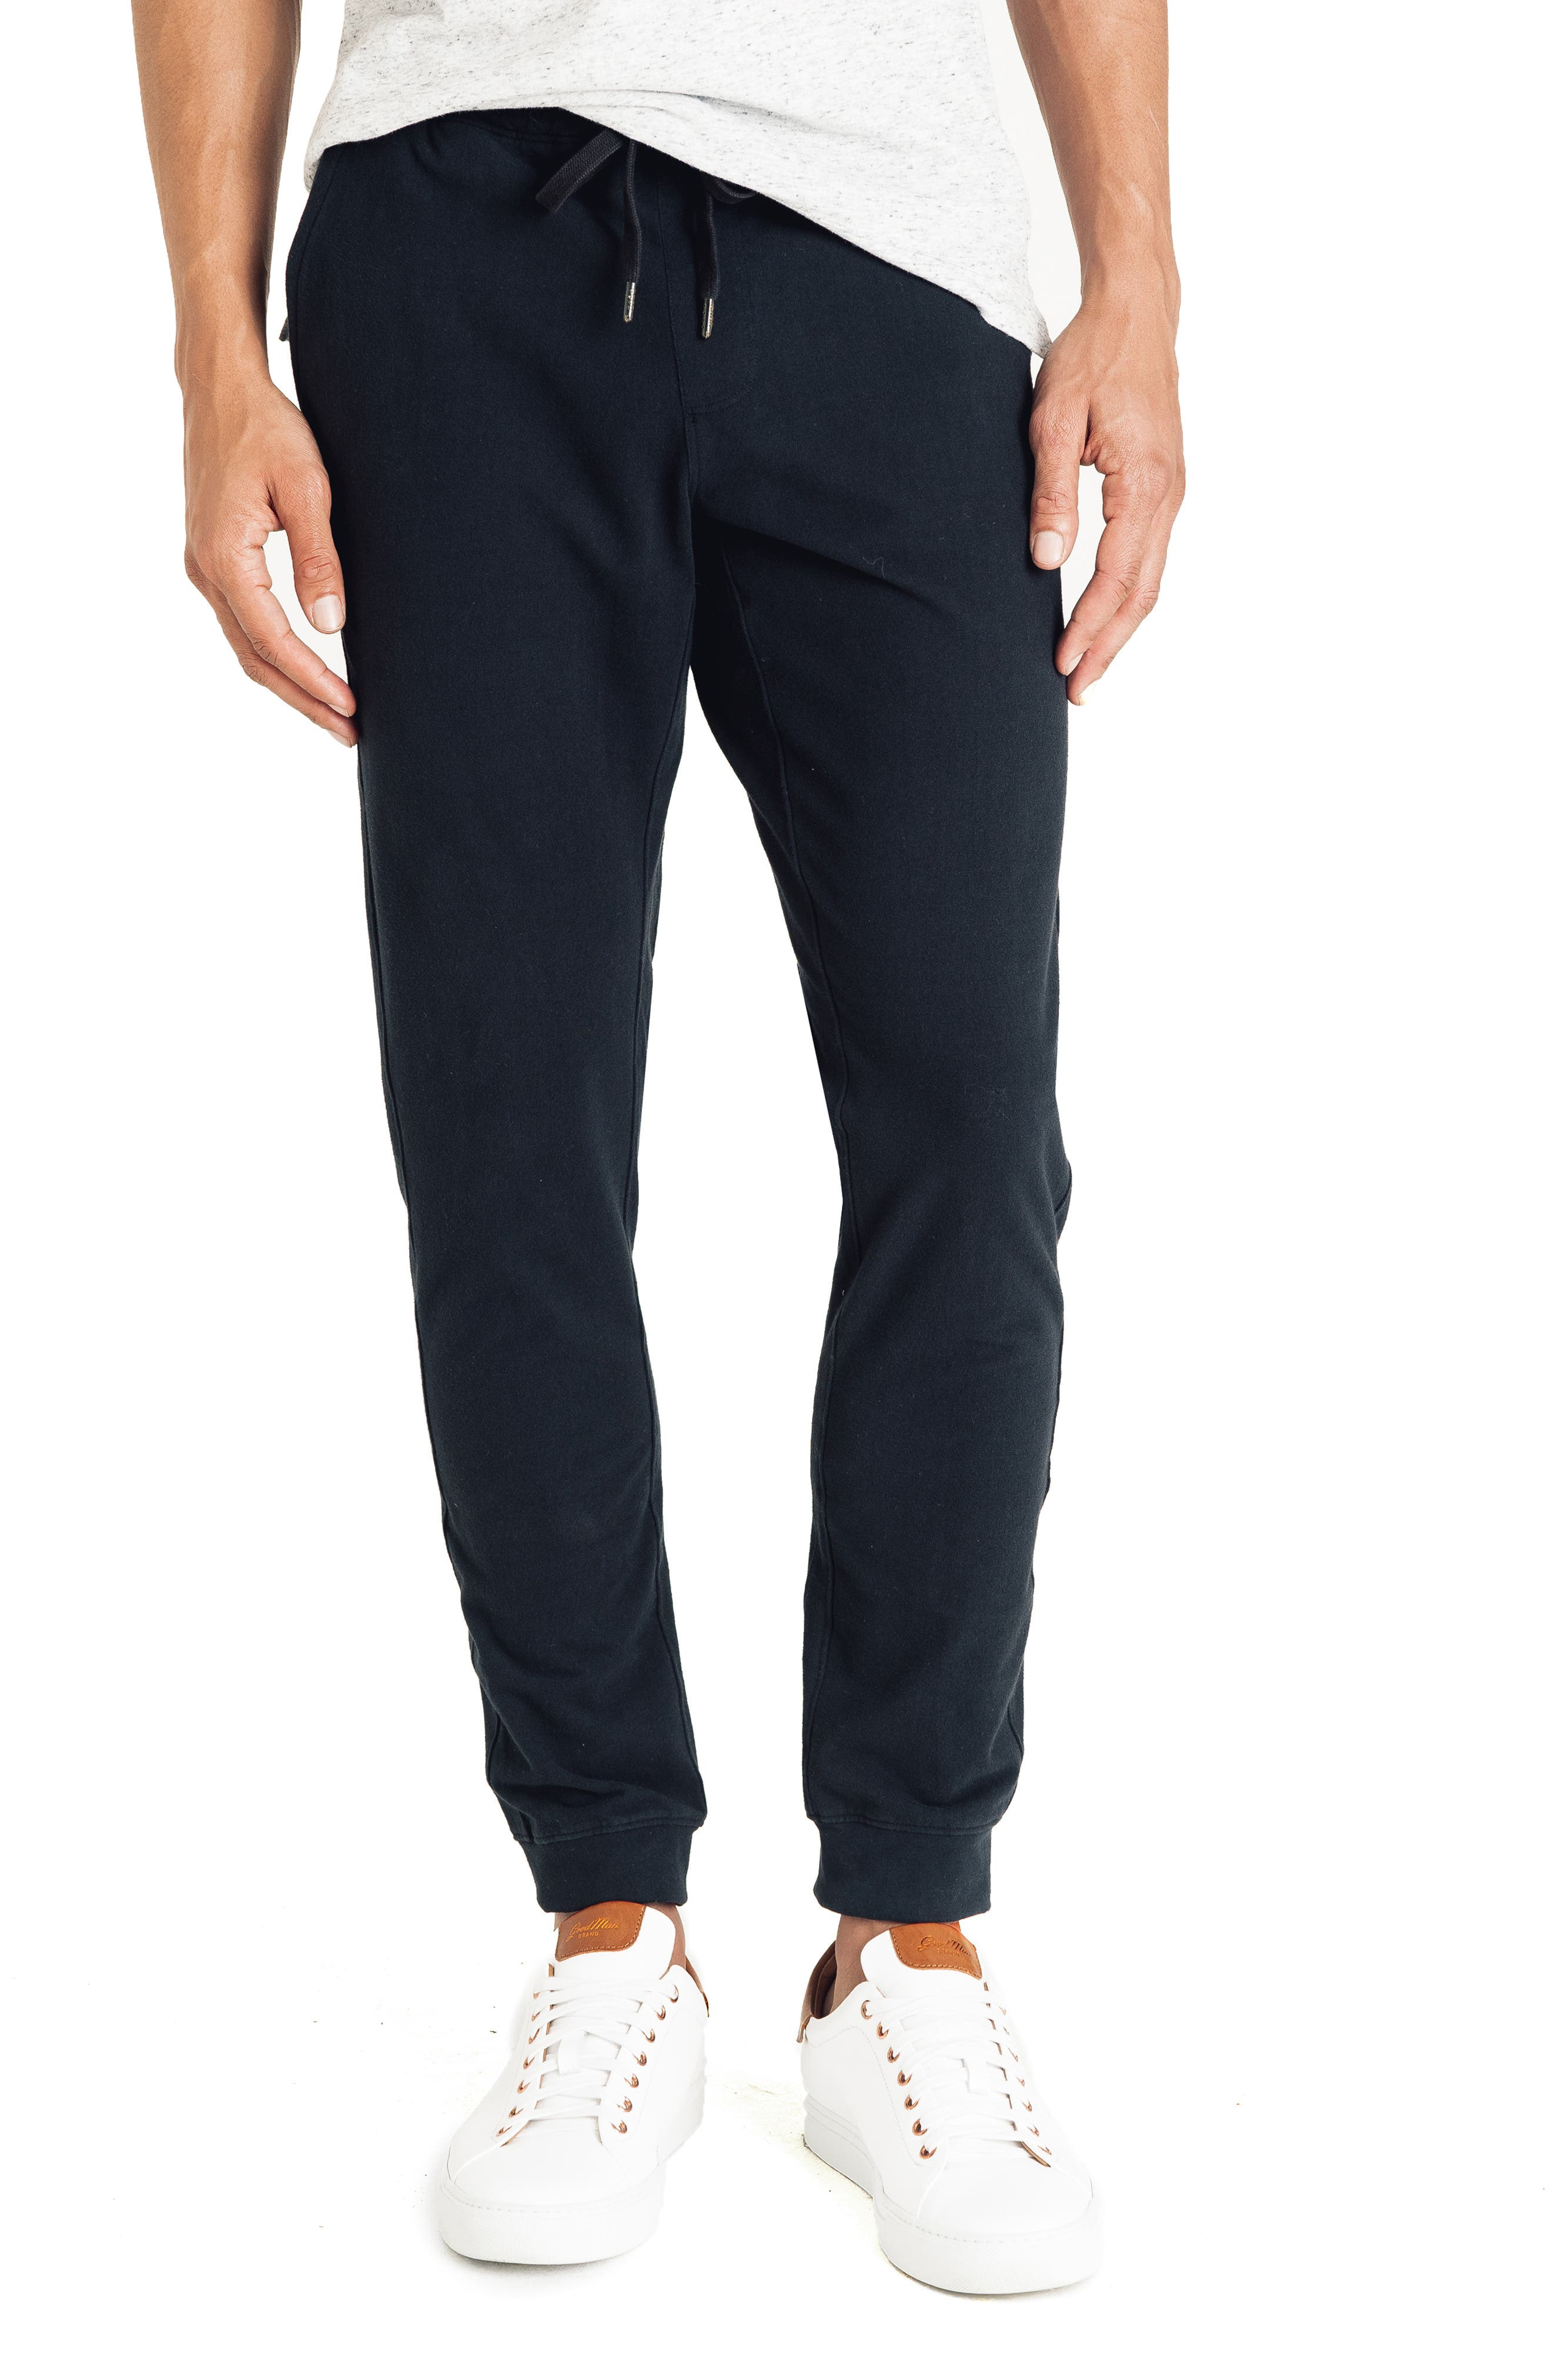 Men's Good Man Brand Pro Slim Fit Jogger Pants